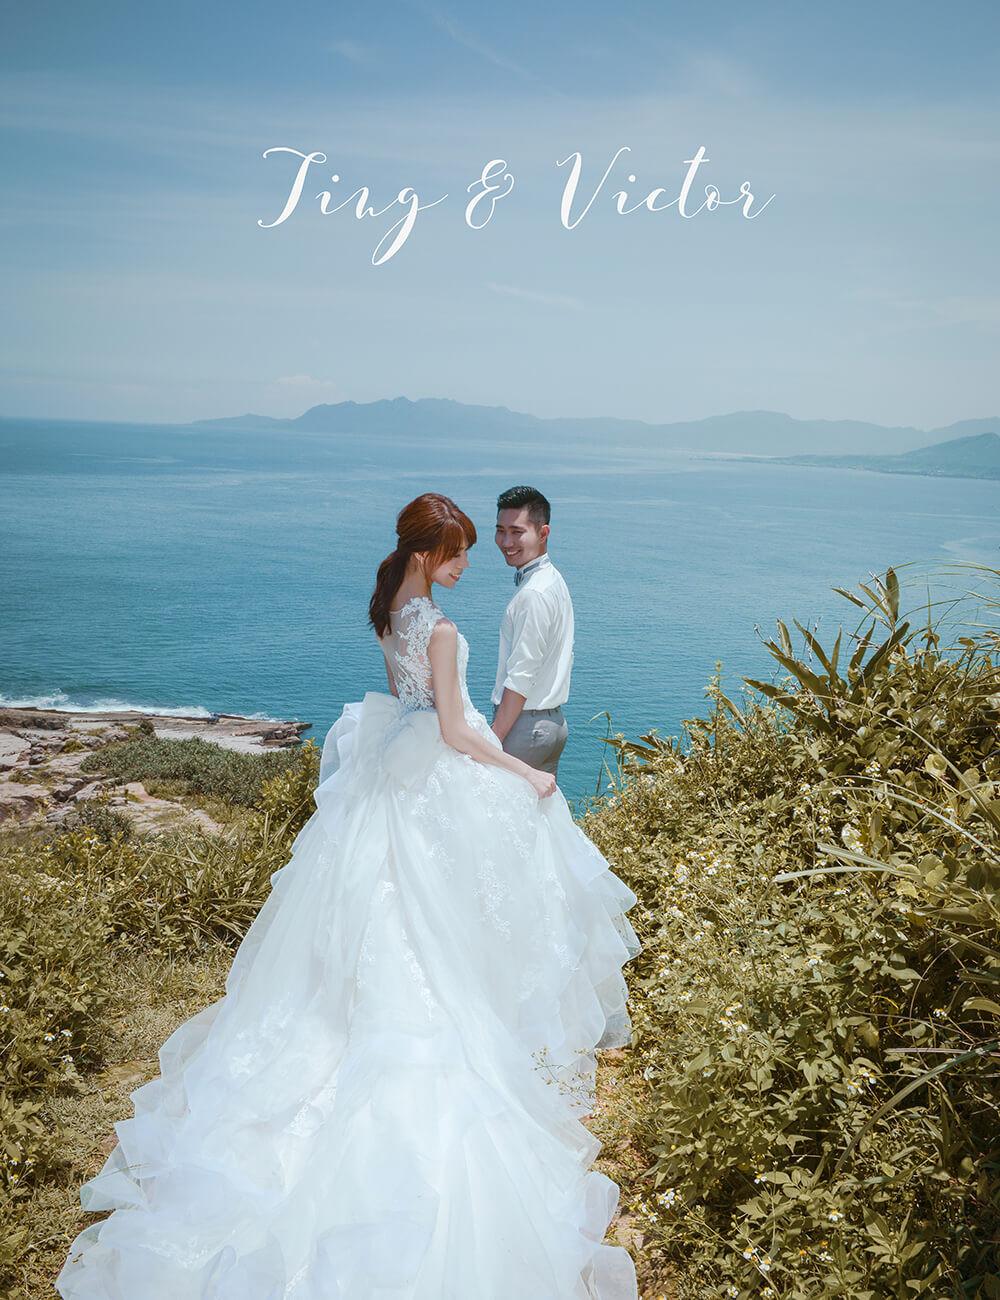 Victor&Ting的淡藍色夏季婚紗